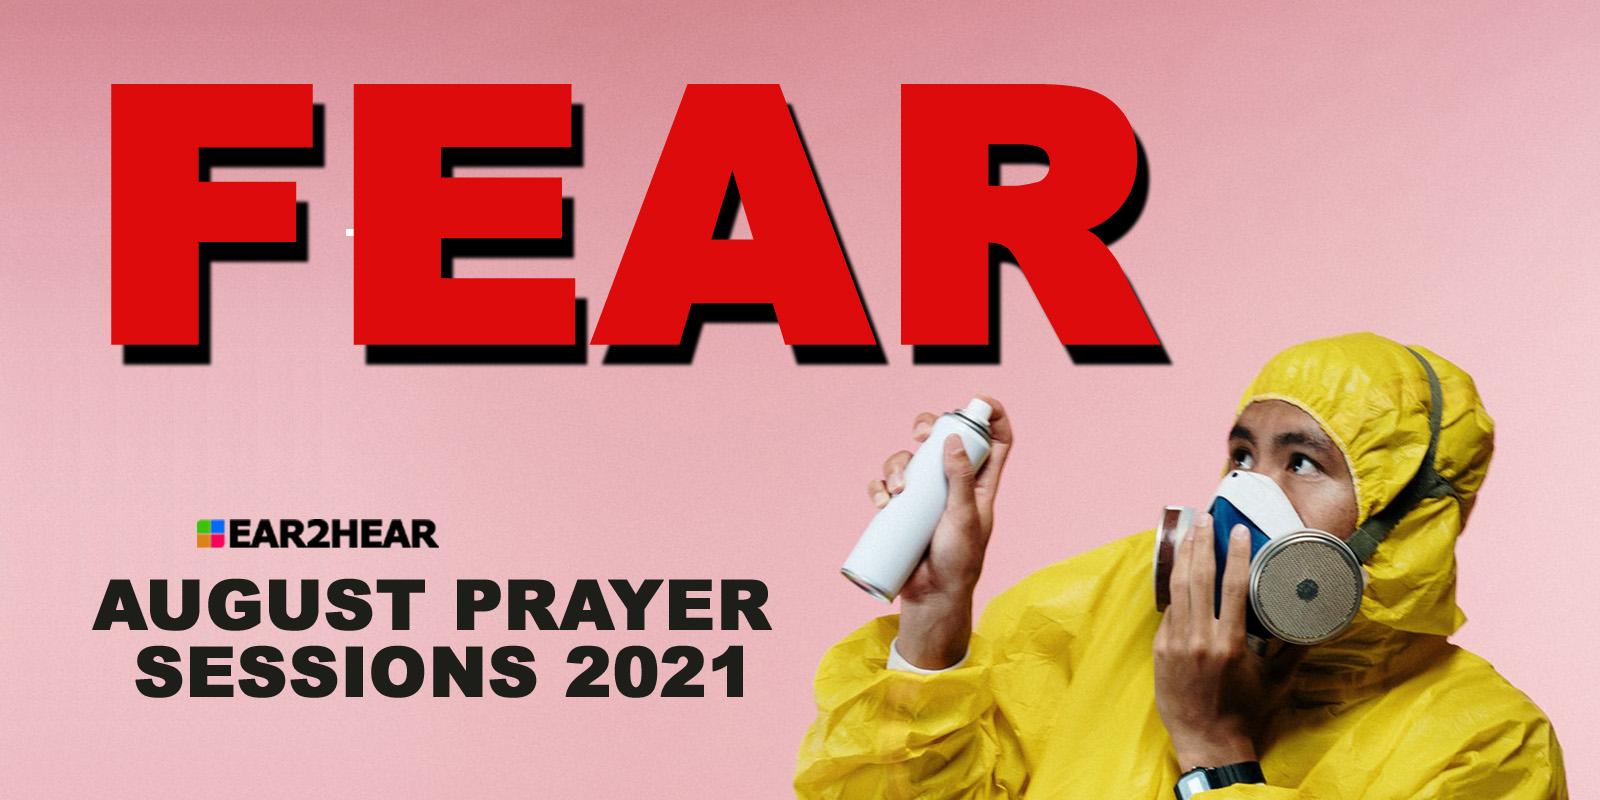 PRAY: AUGUST PRAYER SESSIONS 2021 – DOWNLOAD FREE DEVOTION